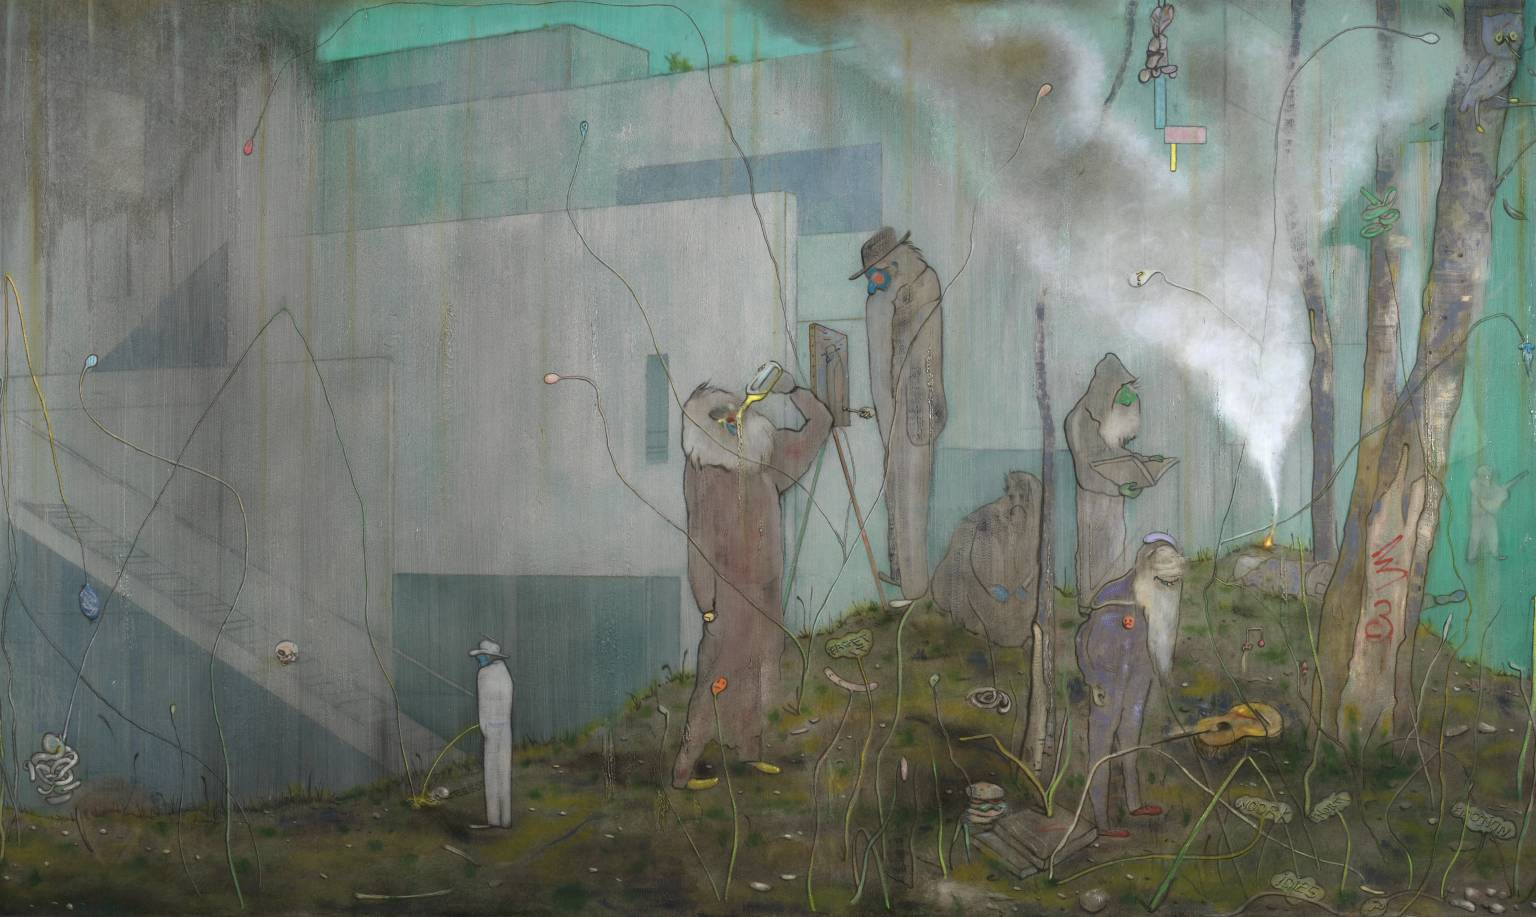 New Accursed Art Club 2007 by Nigel Cooke born 1973